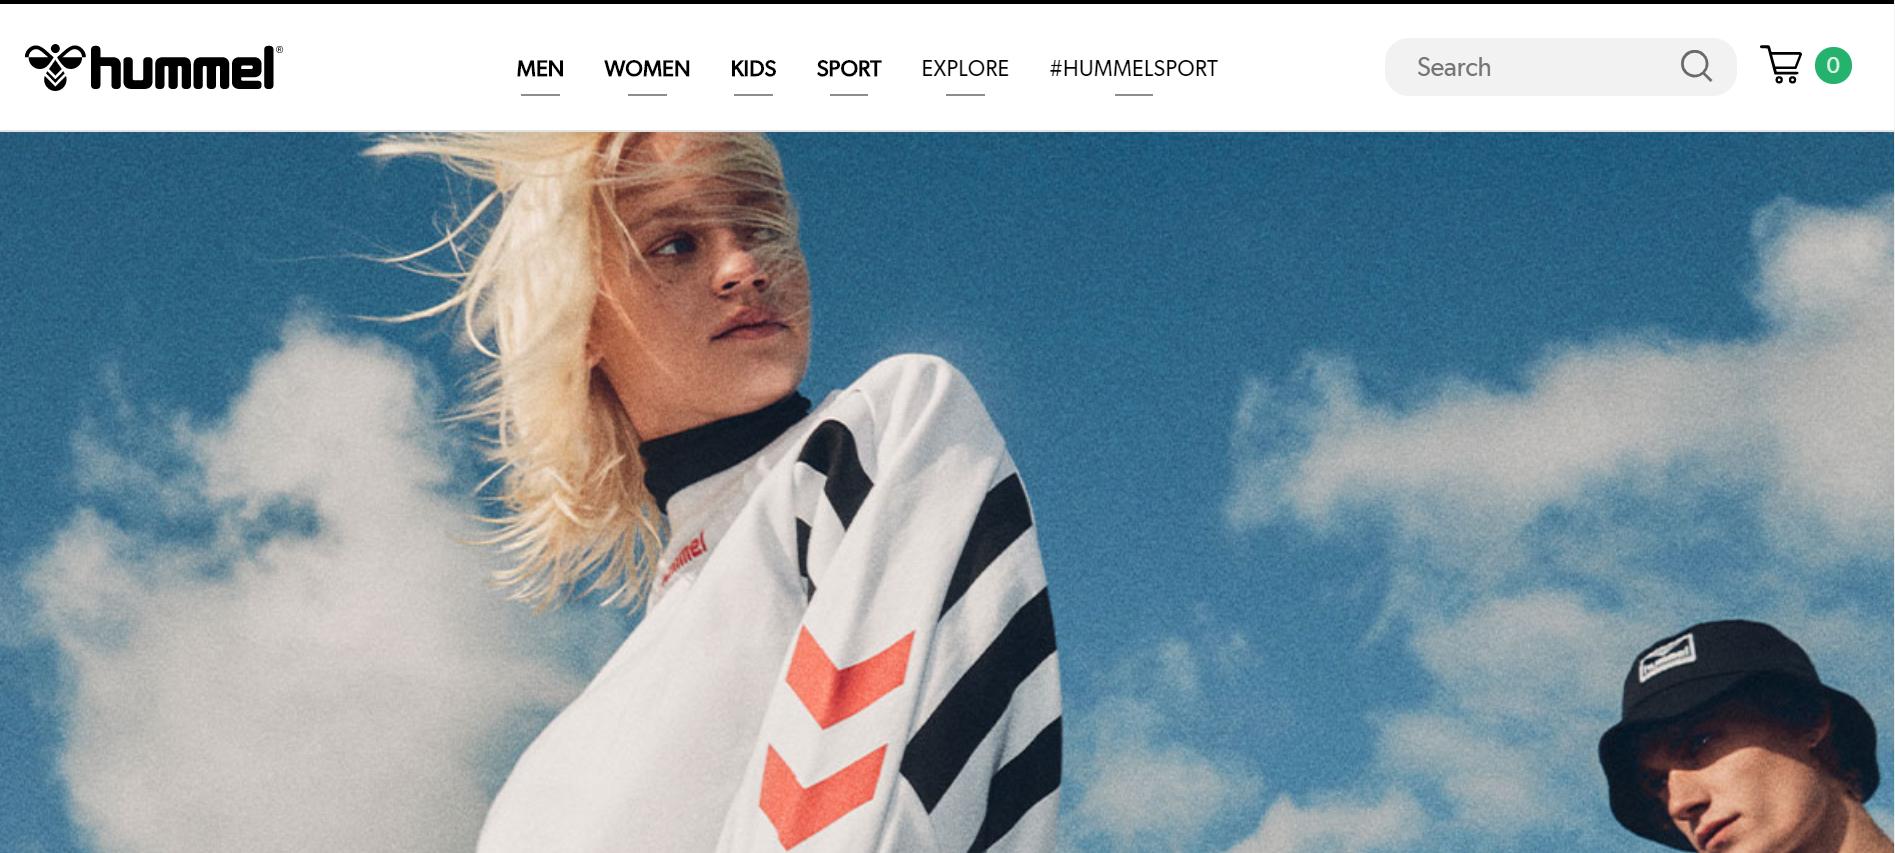 H&M和开云集团支持的可持续时尚科技公司 Worn Again Technologies 开设试点研发中心